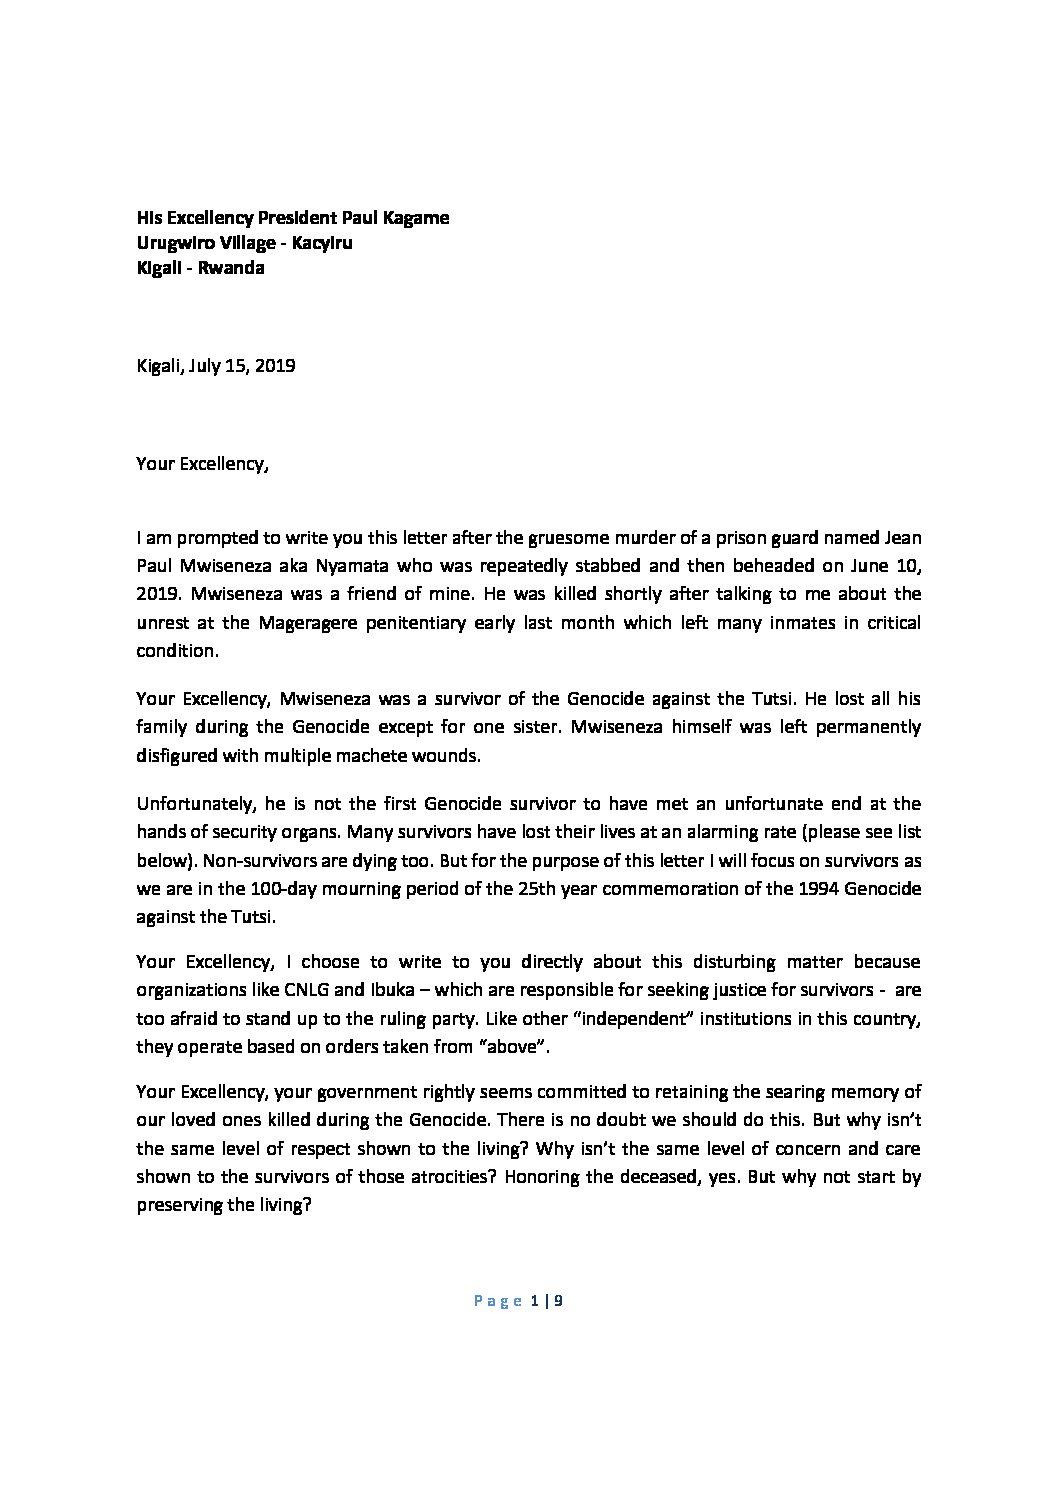 Open Letter to President Paul Kagame